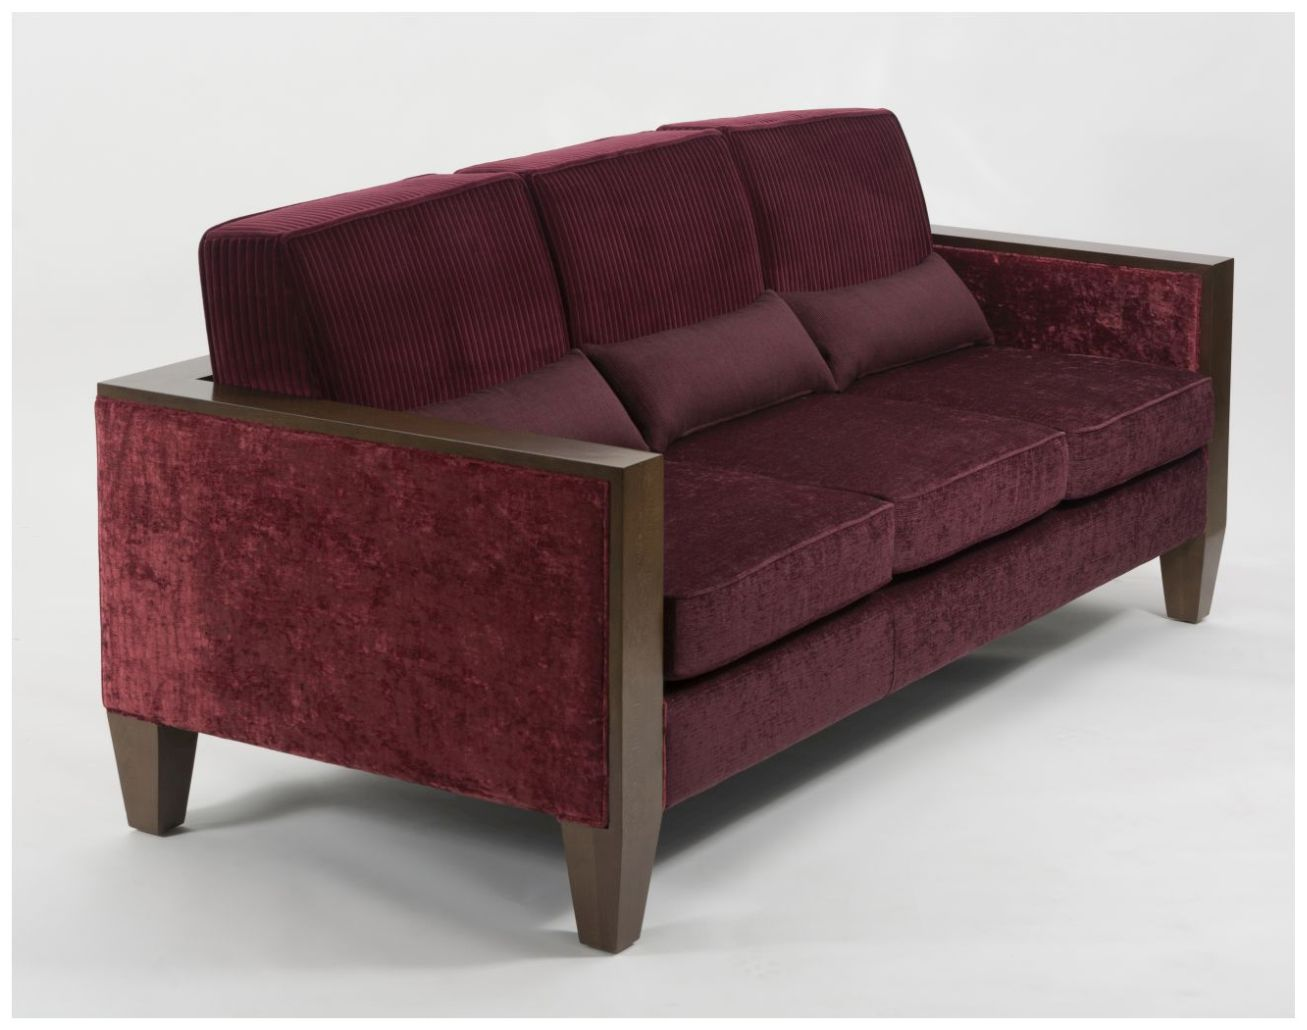 Custom Hotel Lounge Sofa with Wood Frame